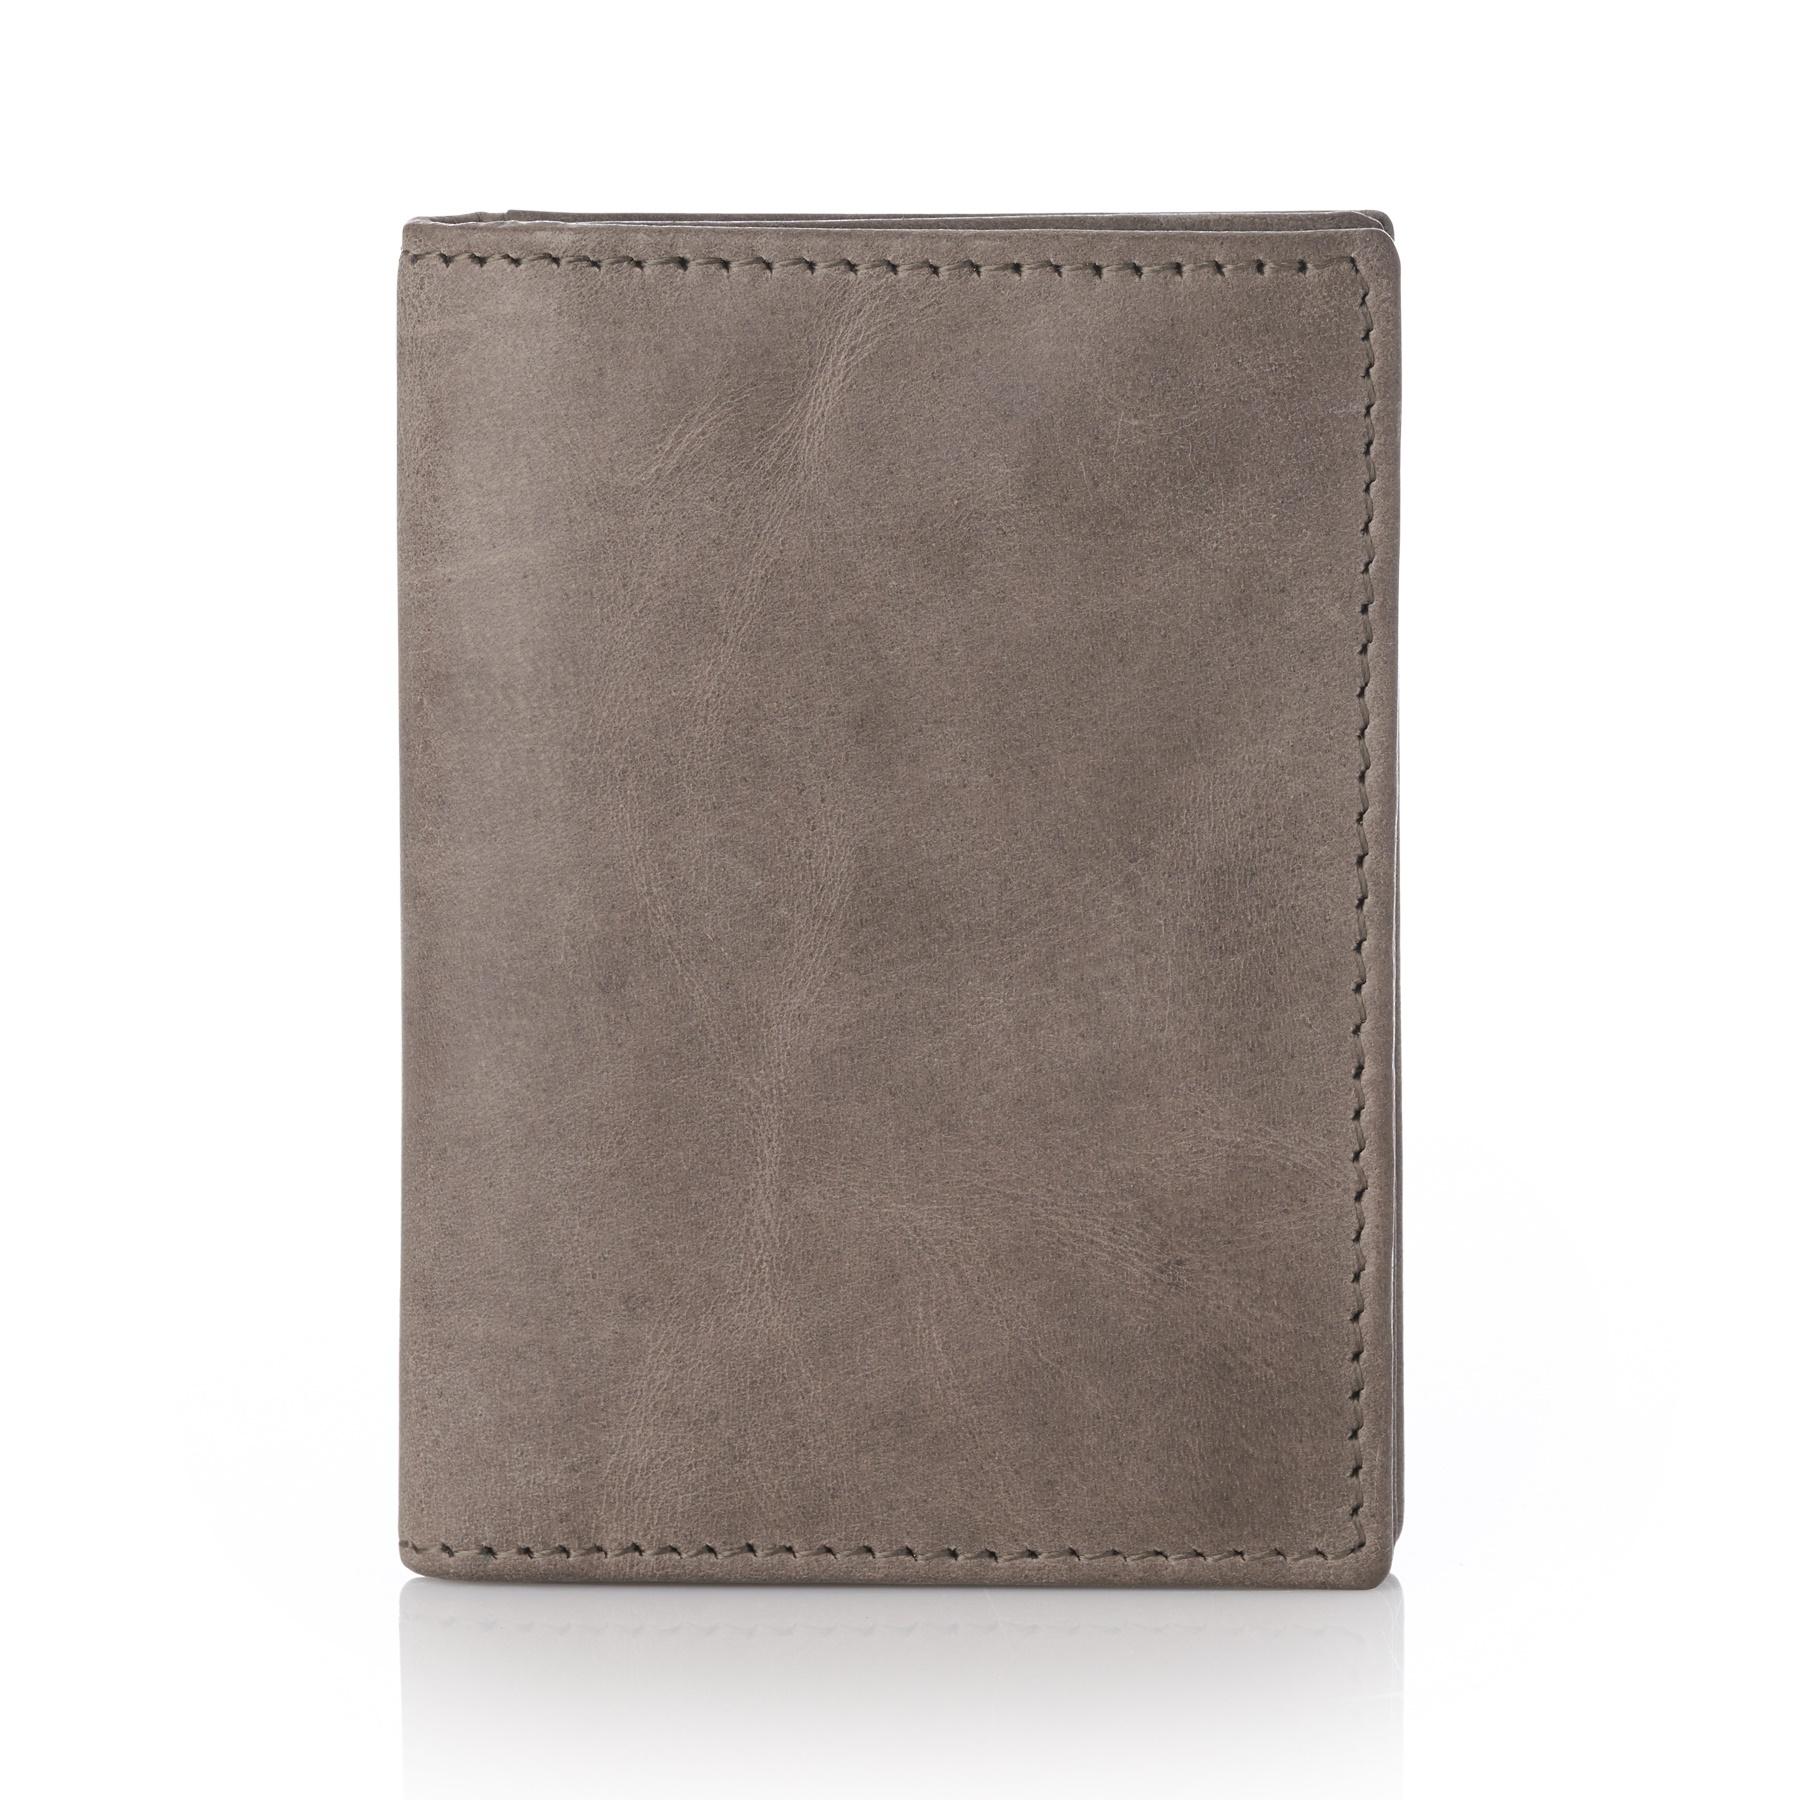 Alpine-Swiss-RFID-Leather-Business-Card-Wallet-Minimalist-ID-Window-Card-Holder thumbnail 40